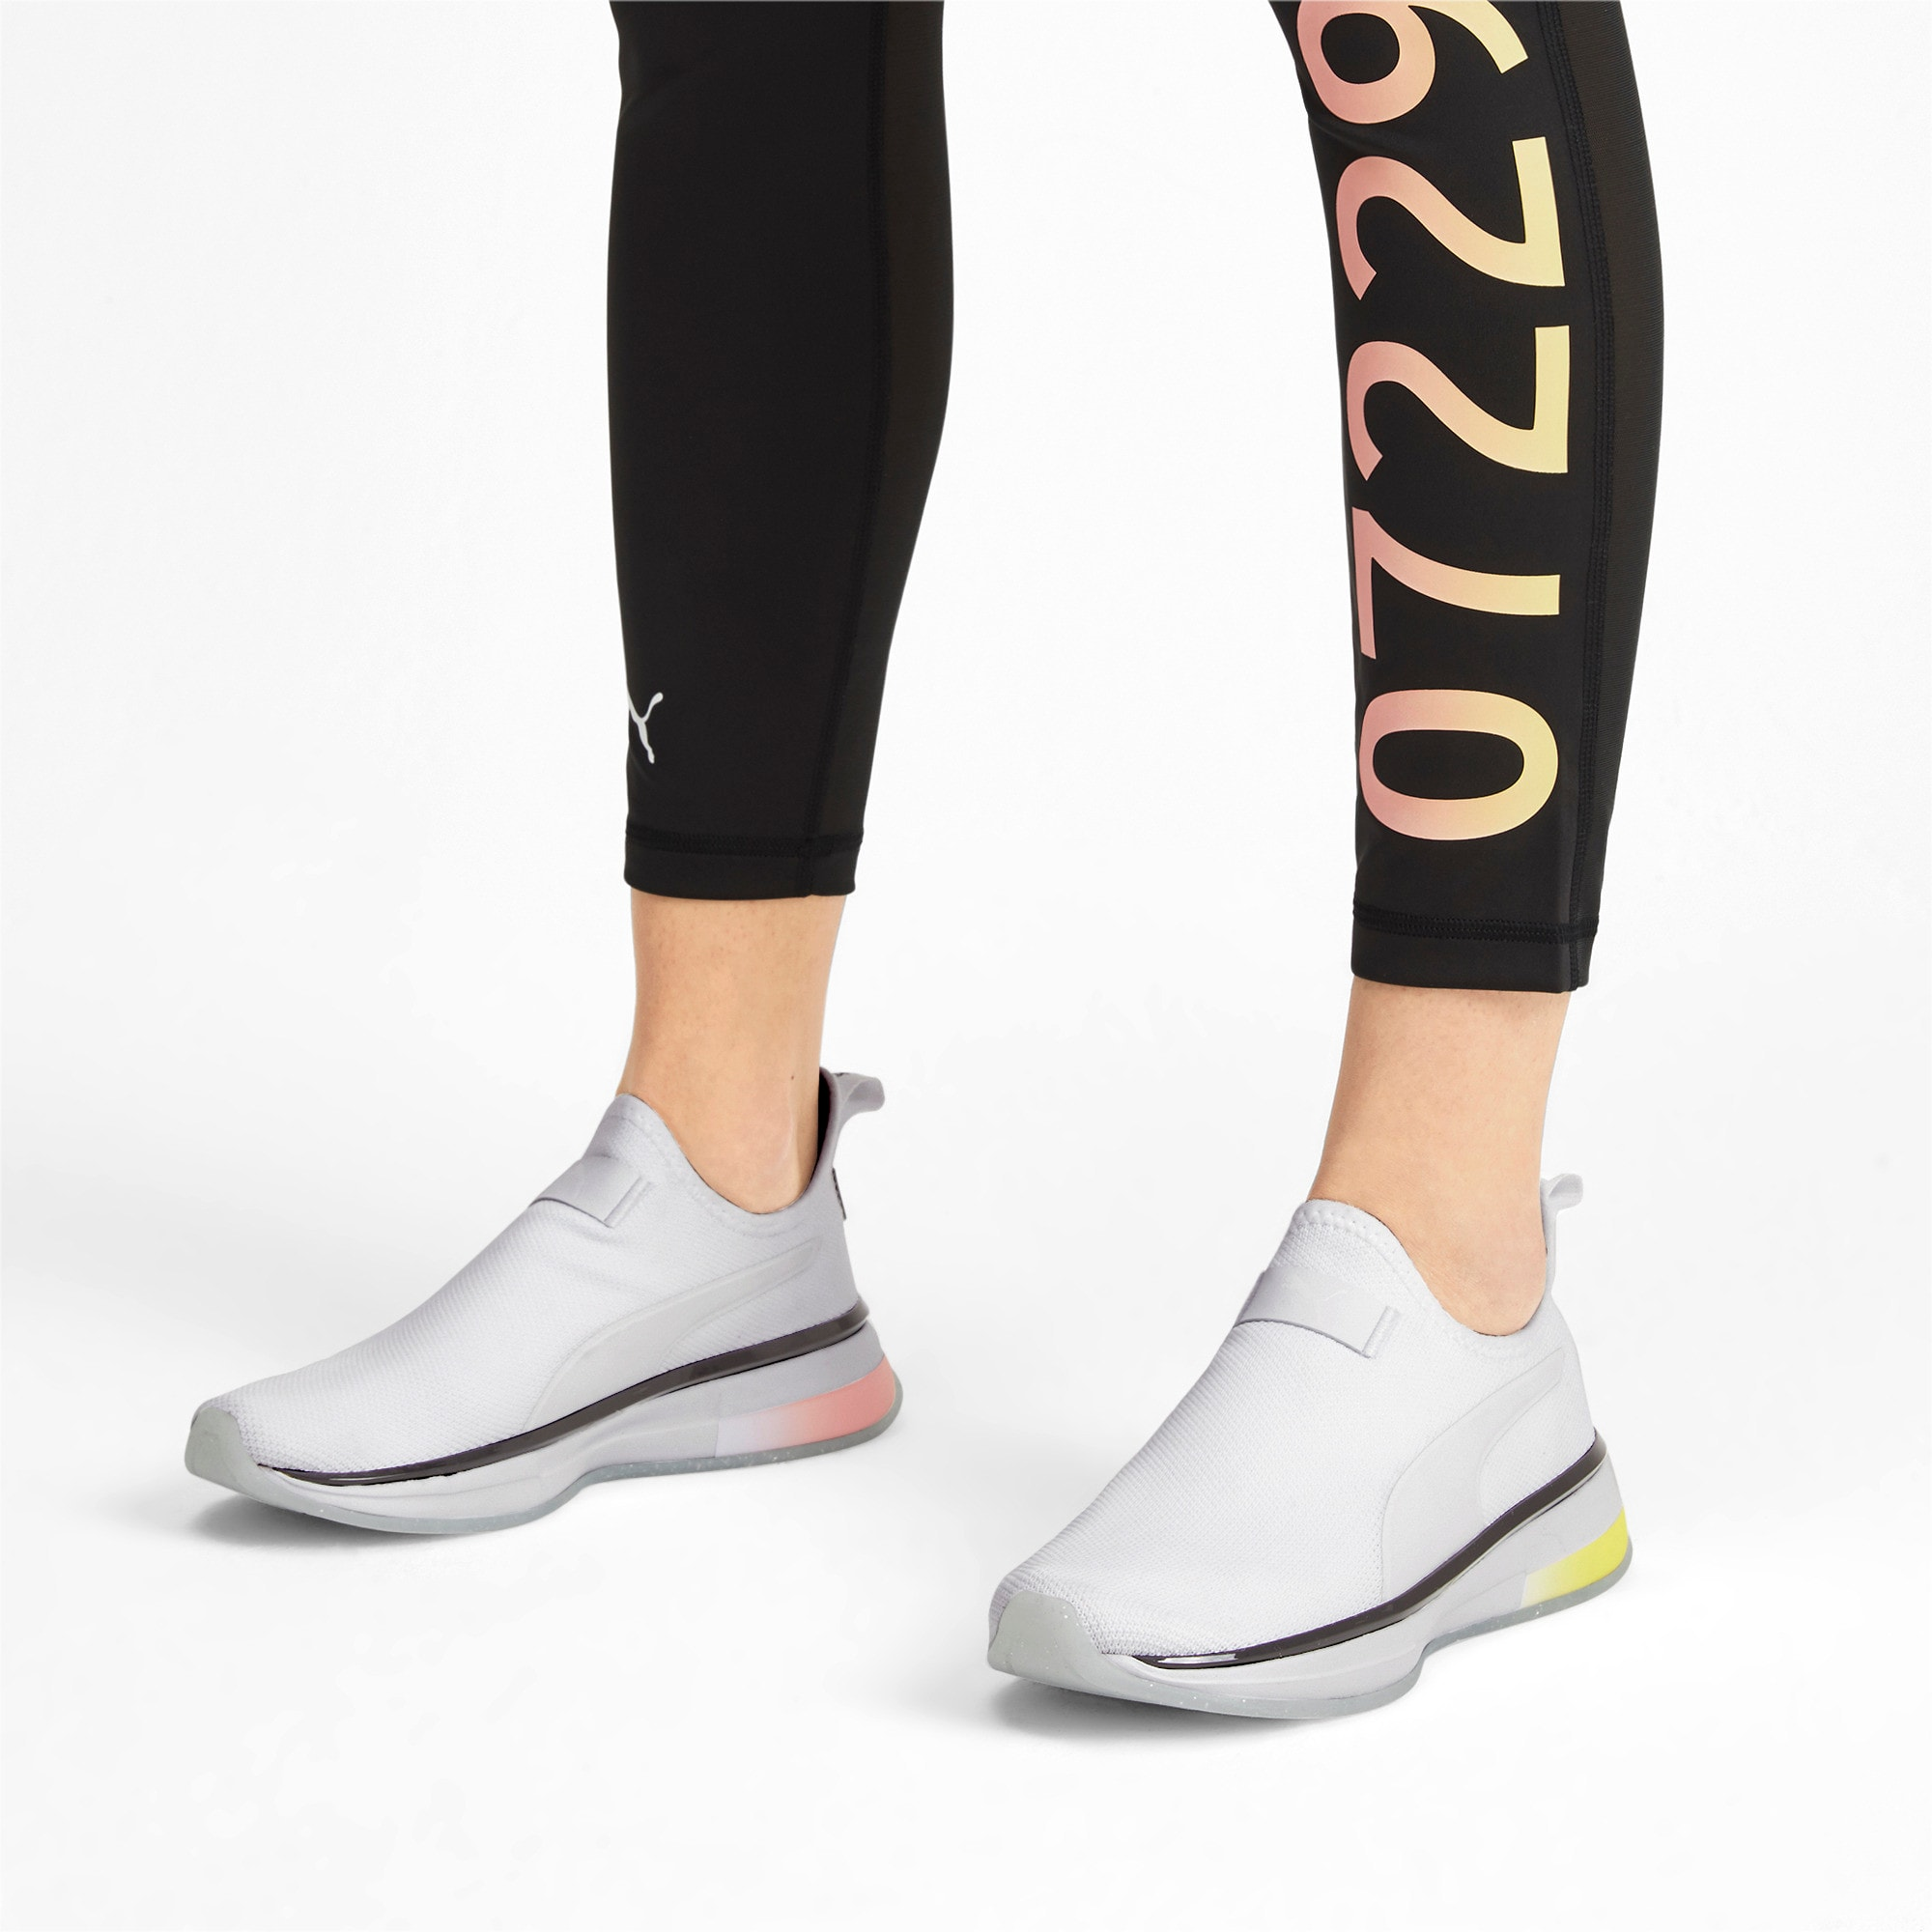 Thumbnail 2 of PUMA x SELENA GOMEZ Slip-On Women's Training Shoes, Puma White-Puma Black, medium